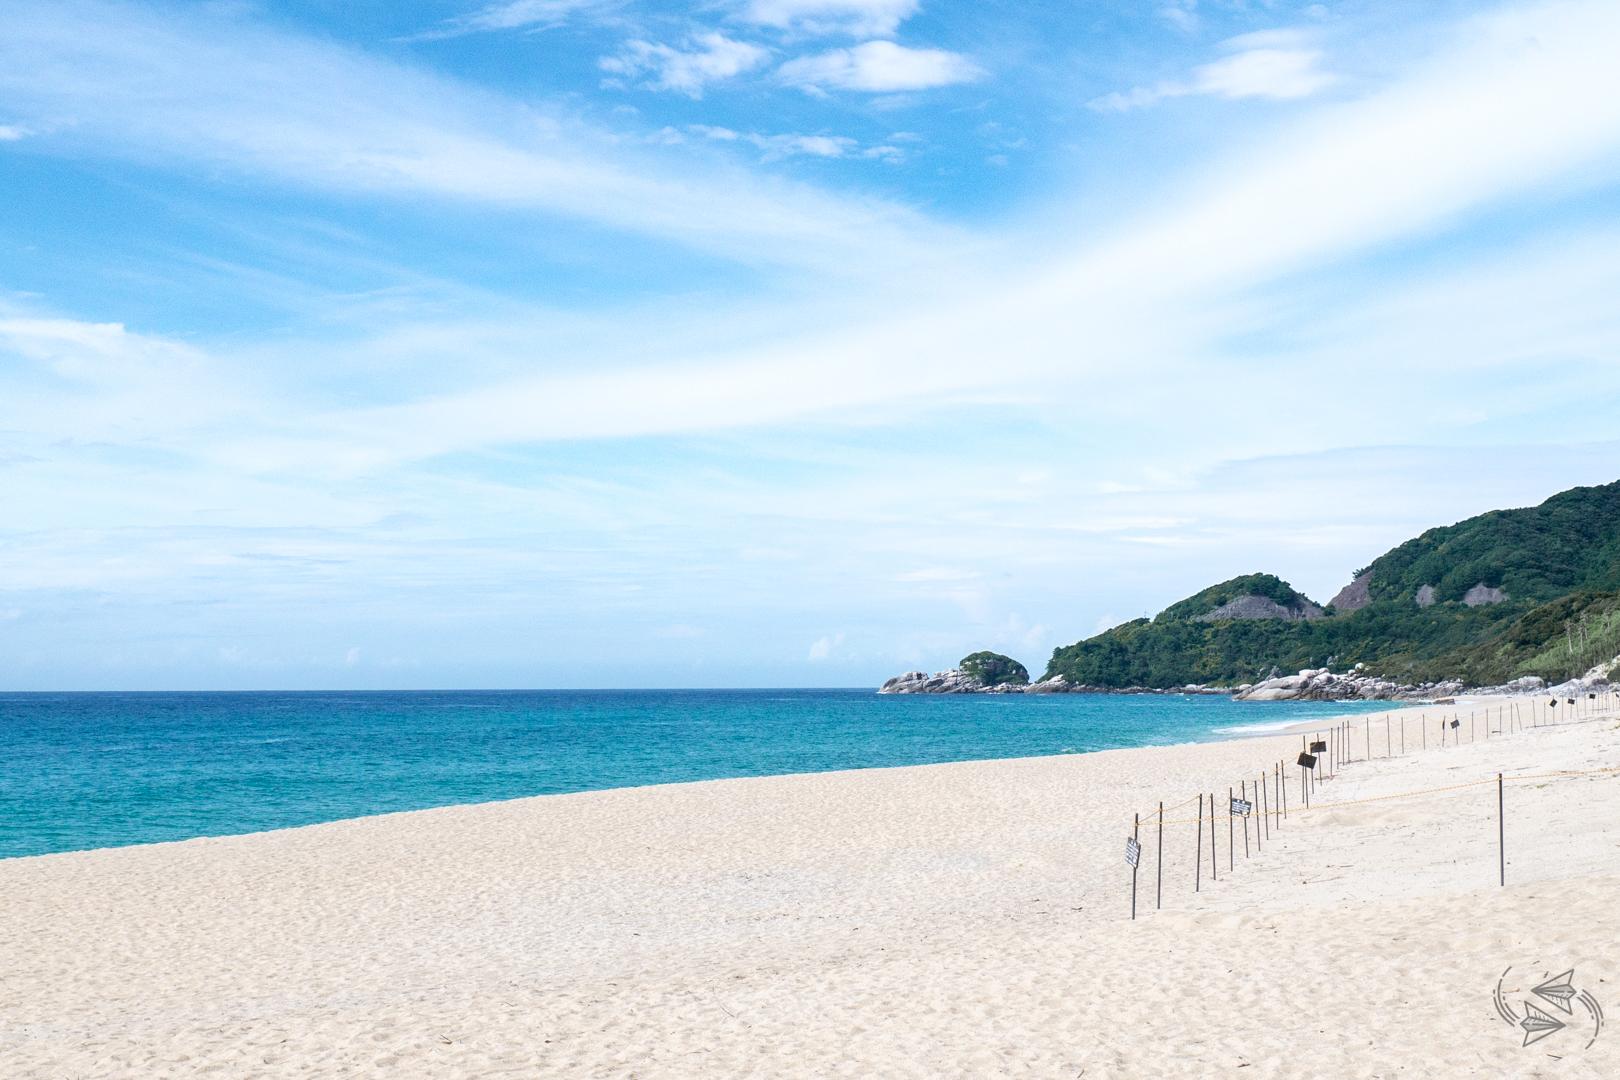 Nagatahama beach Inakahama beach Yakushima Kagoshima Japan